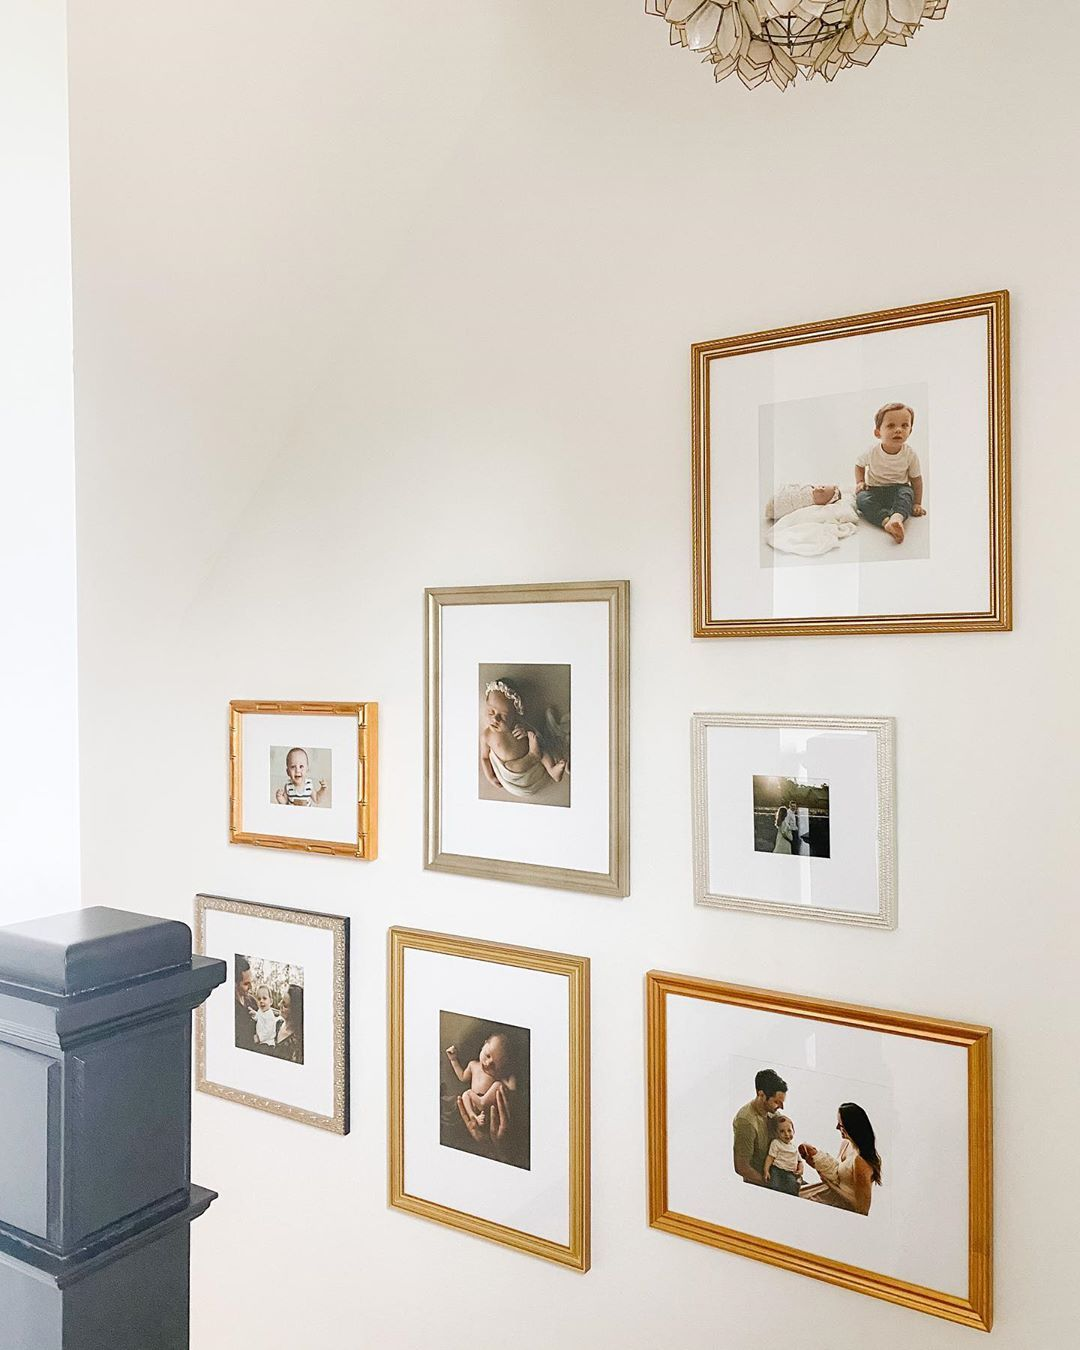 Custom Framing Online Upload And Frame Your Pictures Print And Frame Frames On Wall Custom Frames Online Gallery Wall Frames